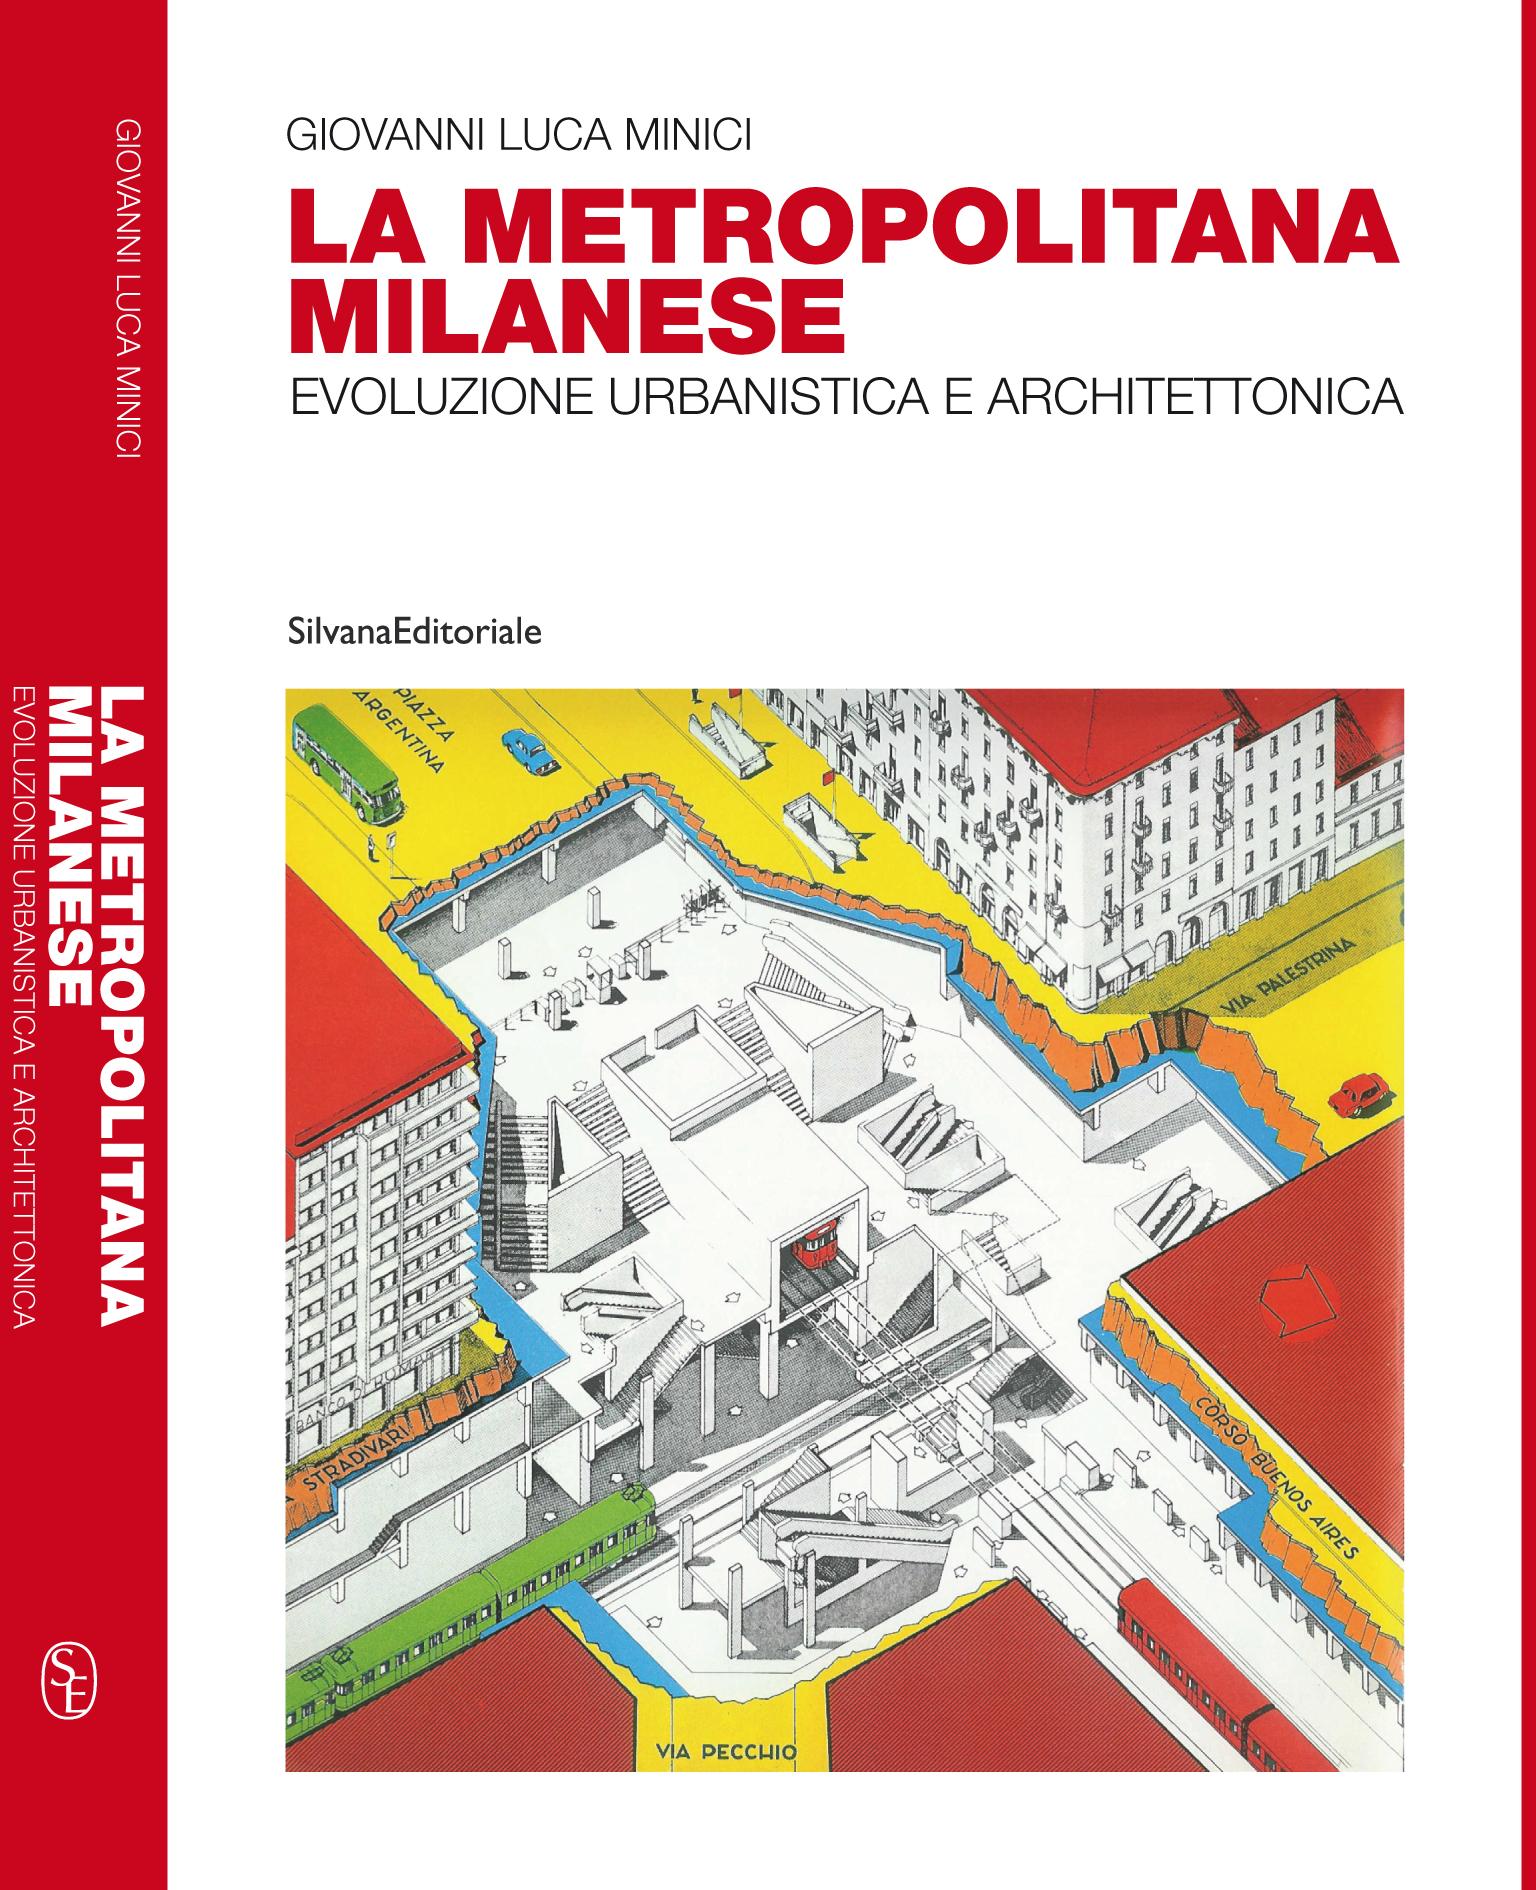 Albero Di Natale Yahoo.Metropolitana Di Milano Linea 1 Metroricerche Blog